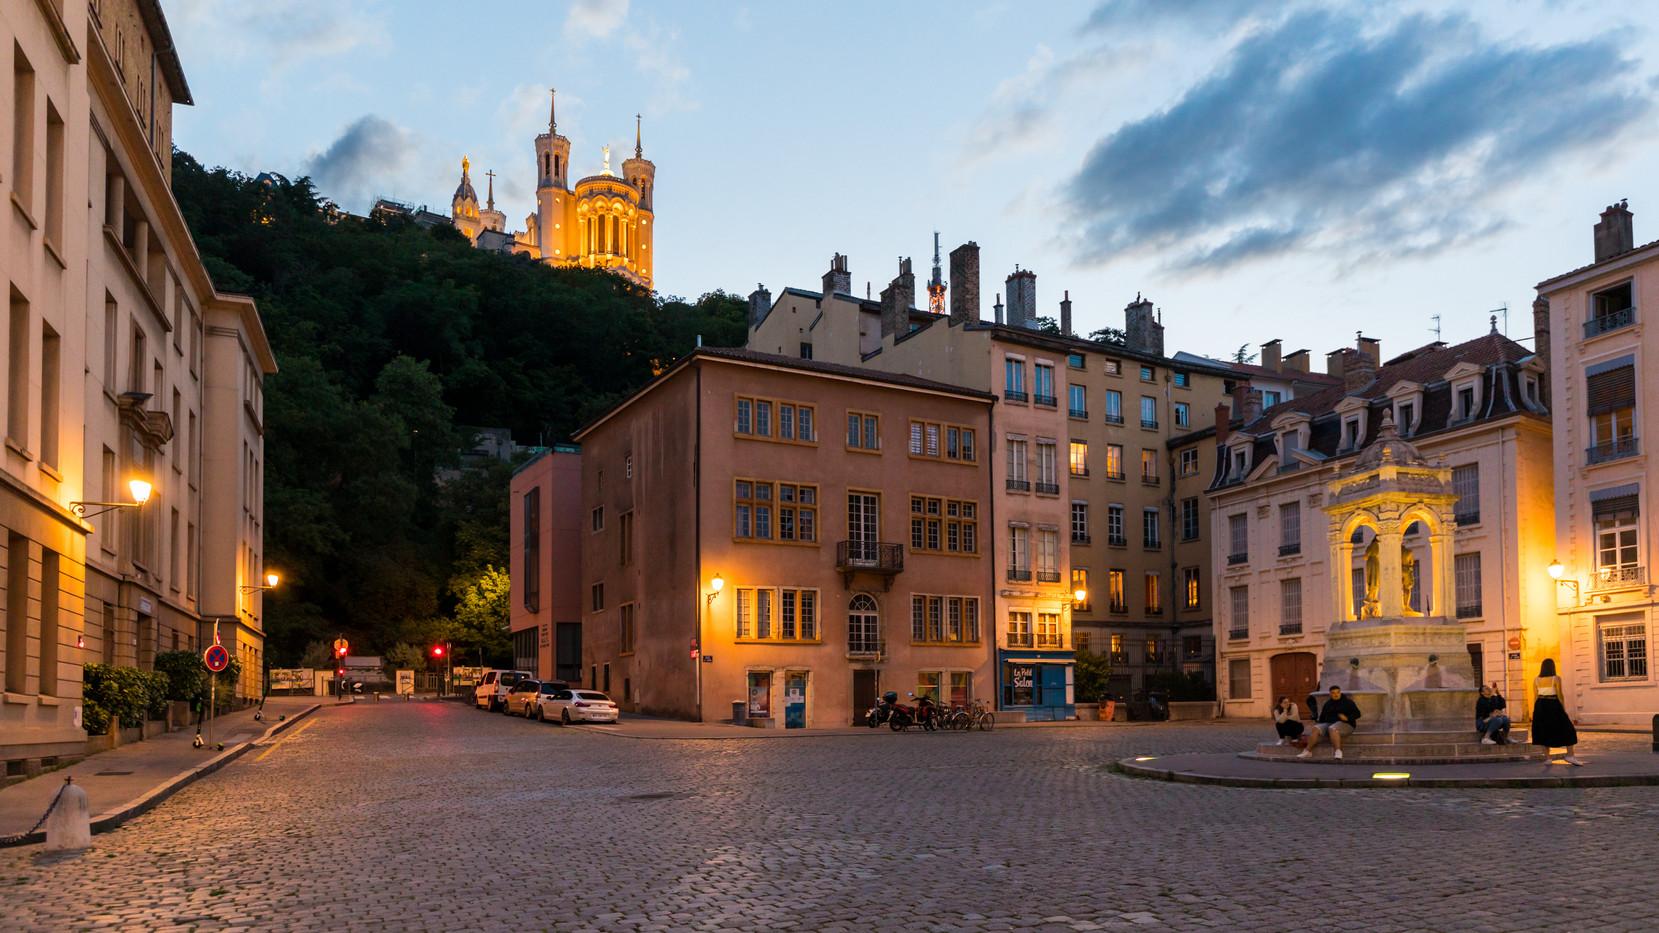 Vieux Lyon, la Place Saint Jean